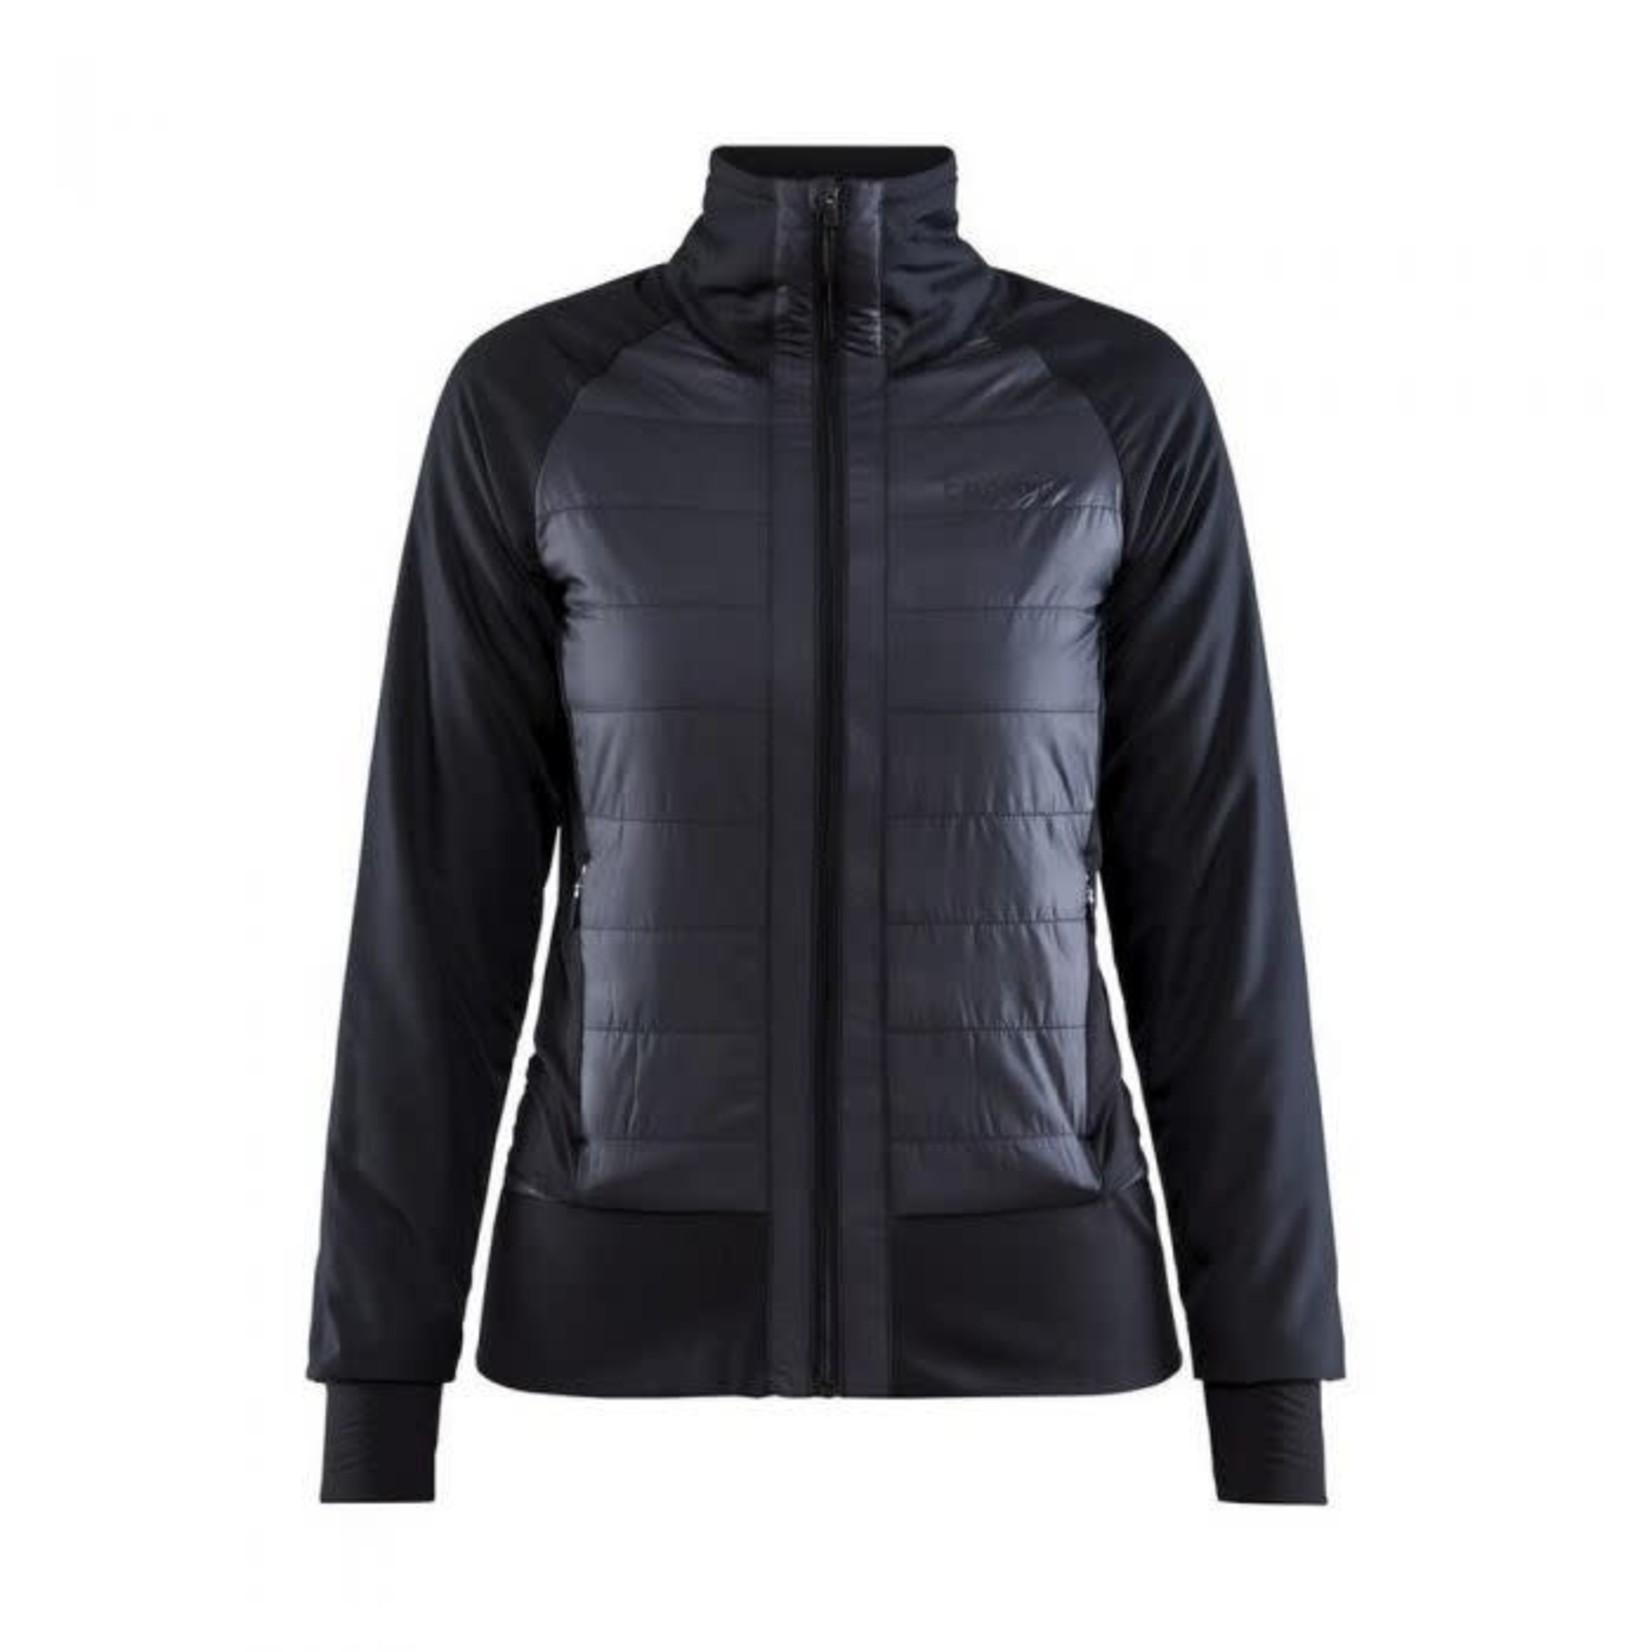 Craft Adv Storm Insulated Jacket W